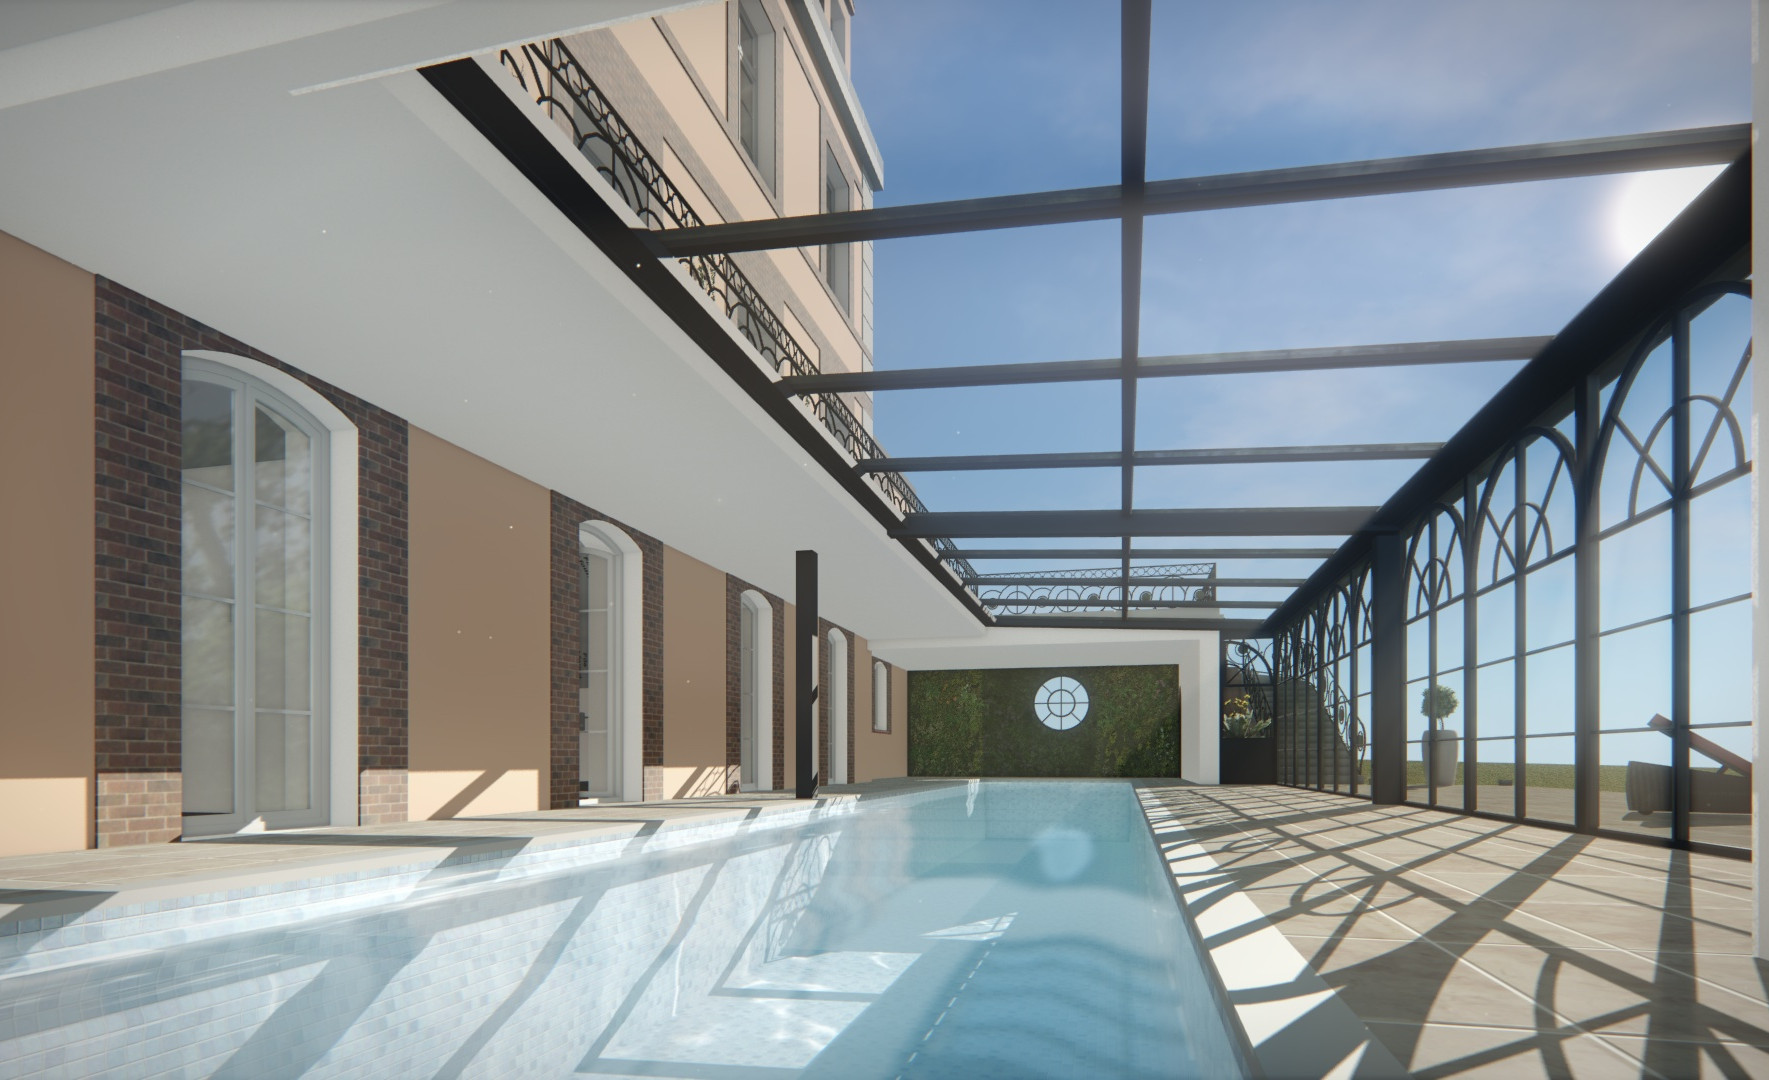 Piscine couverte 25 m - extension 200 m² - SCI IV MARTIN.jpg